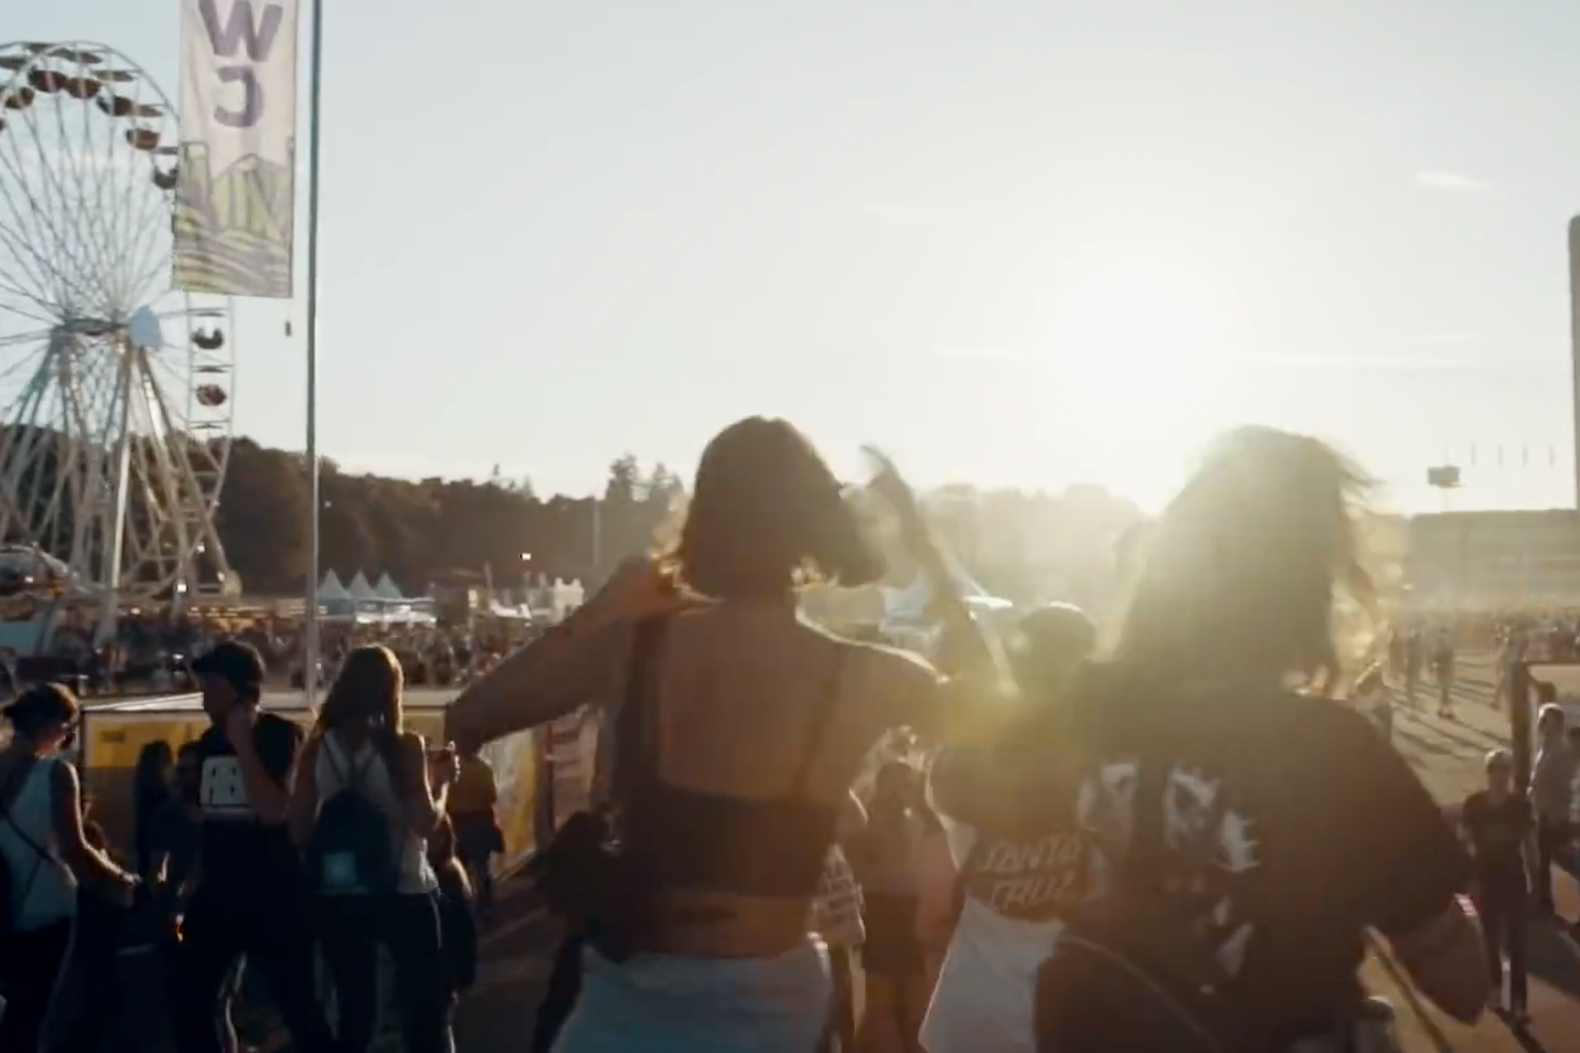 LOLLAPALOOZA 2018 - FESTIVAL AFTERMOVIE